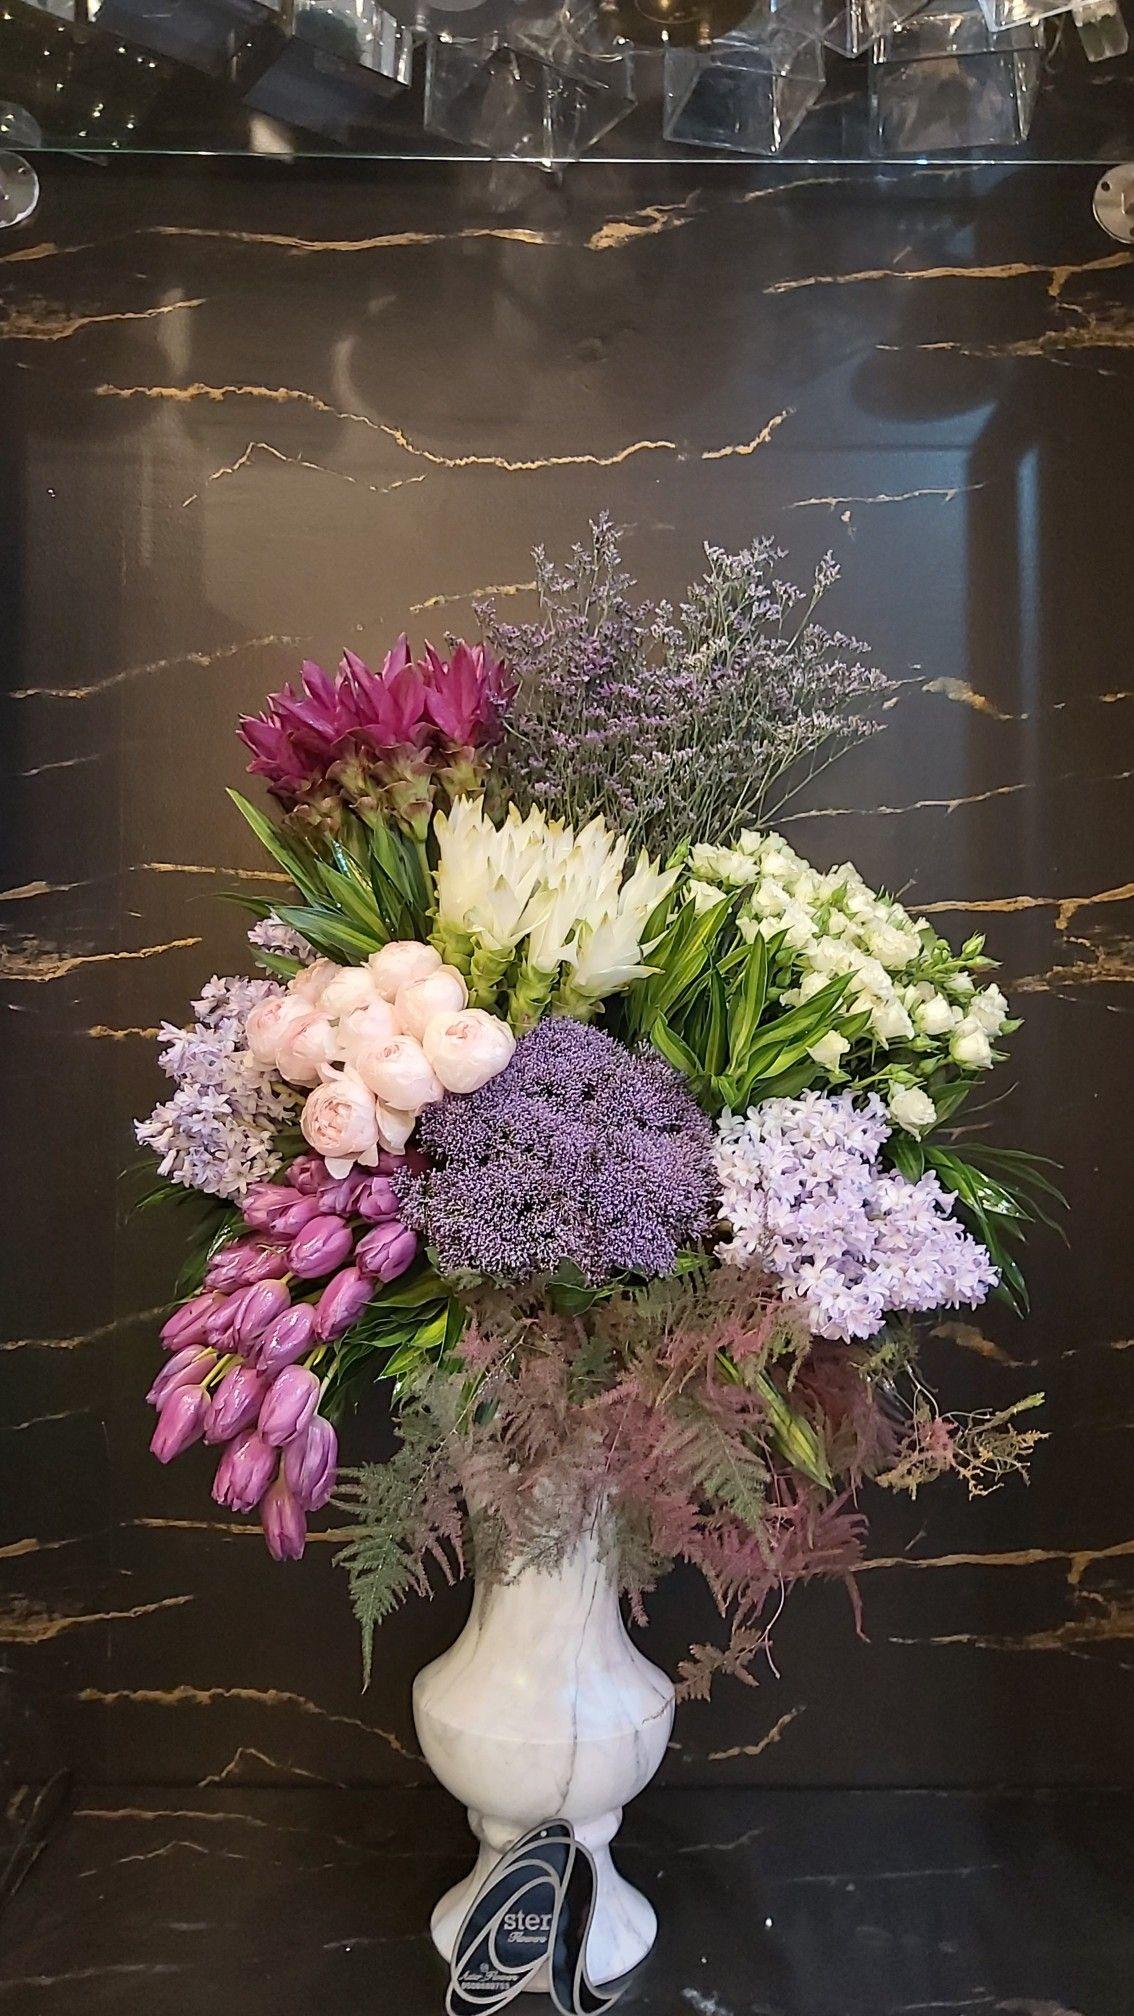 Pin By Melindading On Designer Flowers In Dubai Aster Flowers Shop In 2020 Floral Wreath Aster Flower Flower Shop